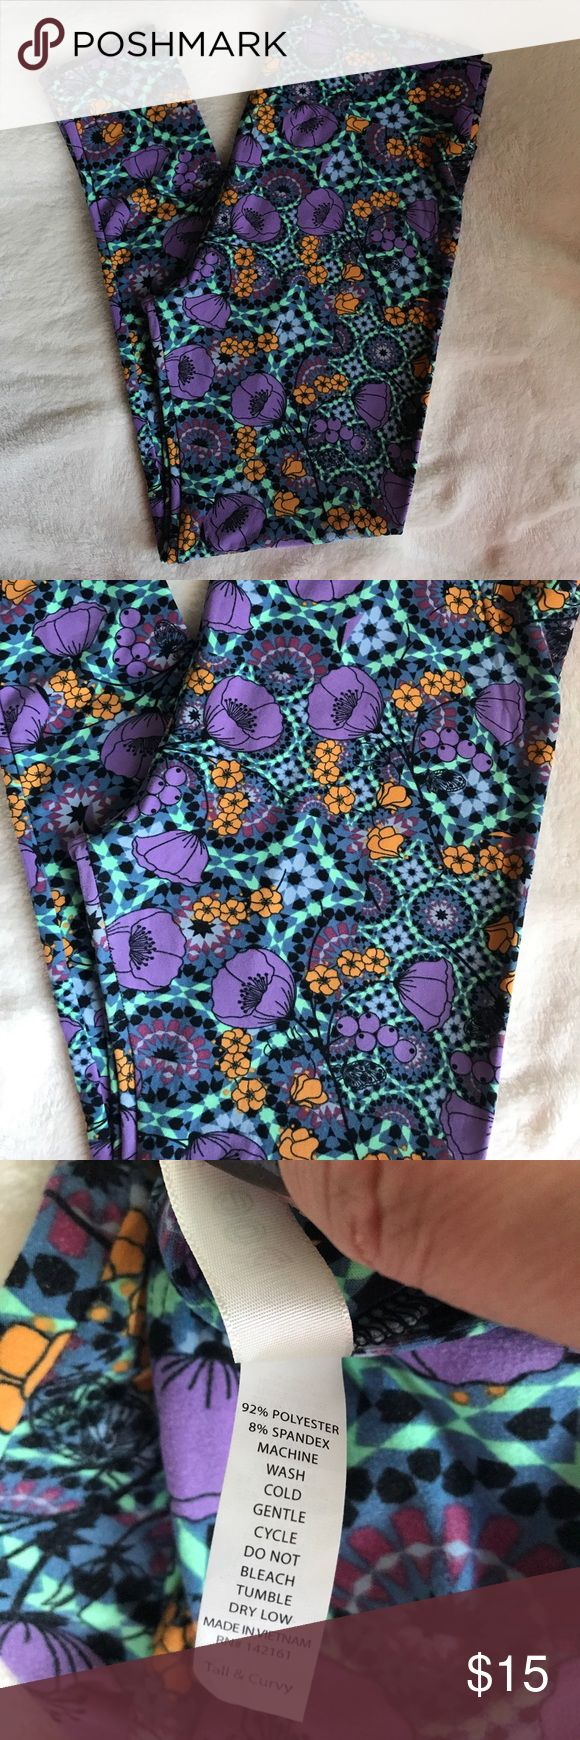 TC LuLaRoe leggings NEW NEVER WORN Purple, gold, mint green, and black LuLaRoe Pants Leggings